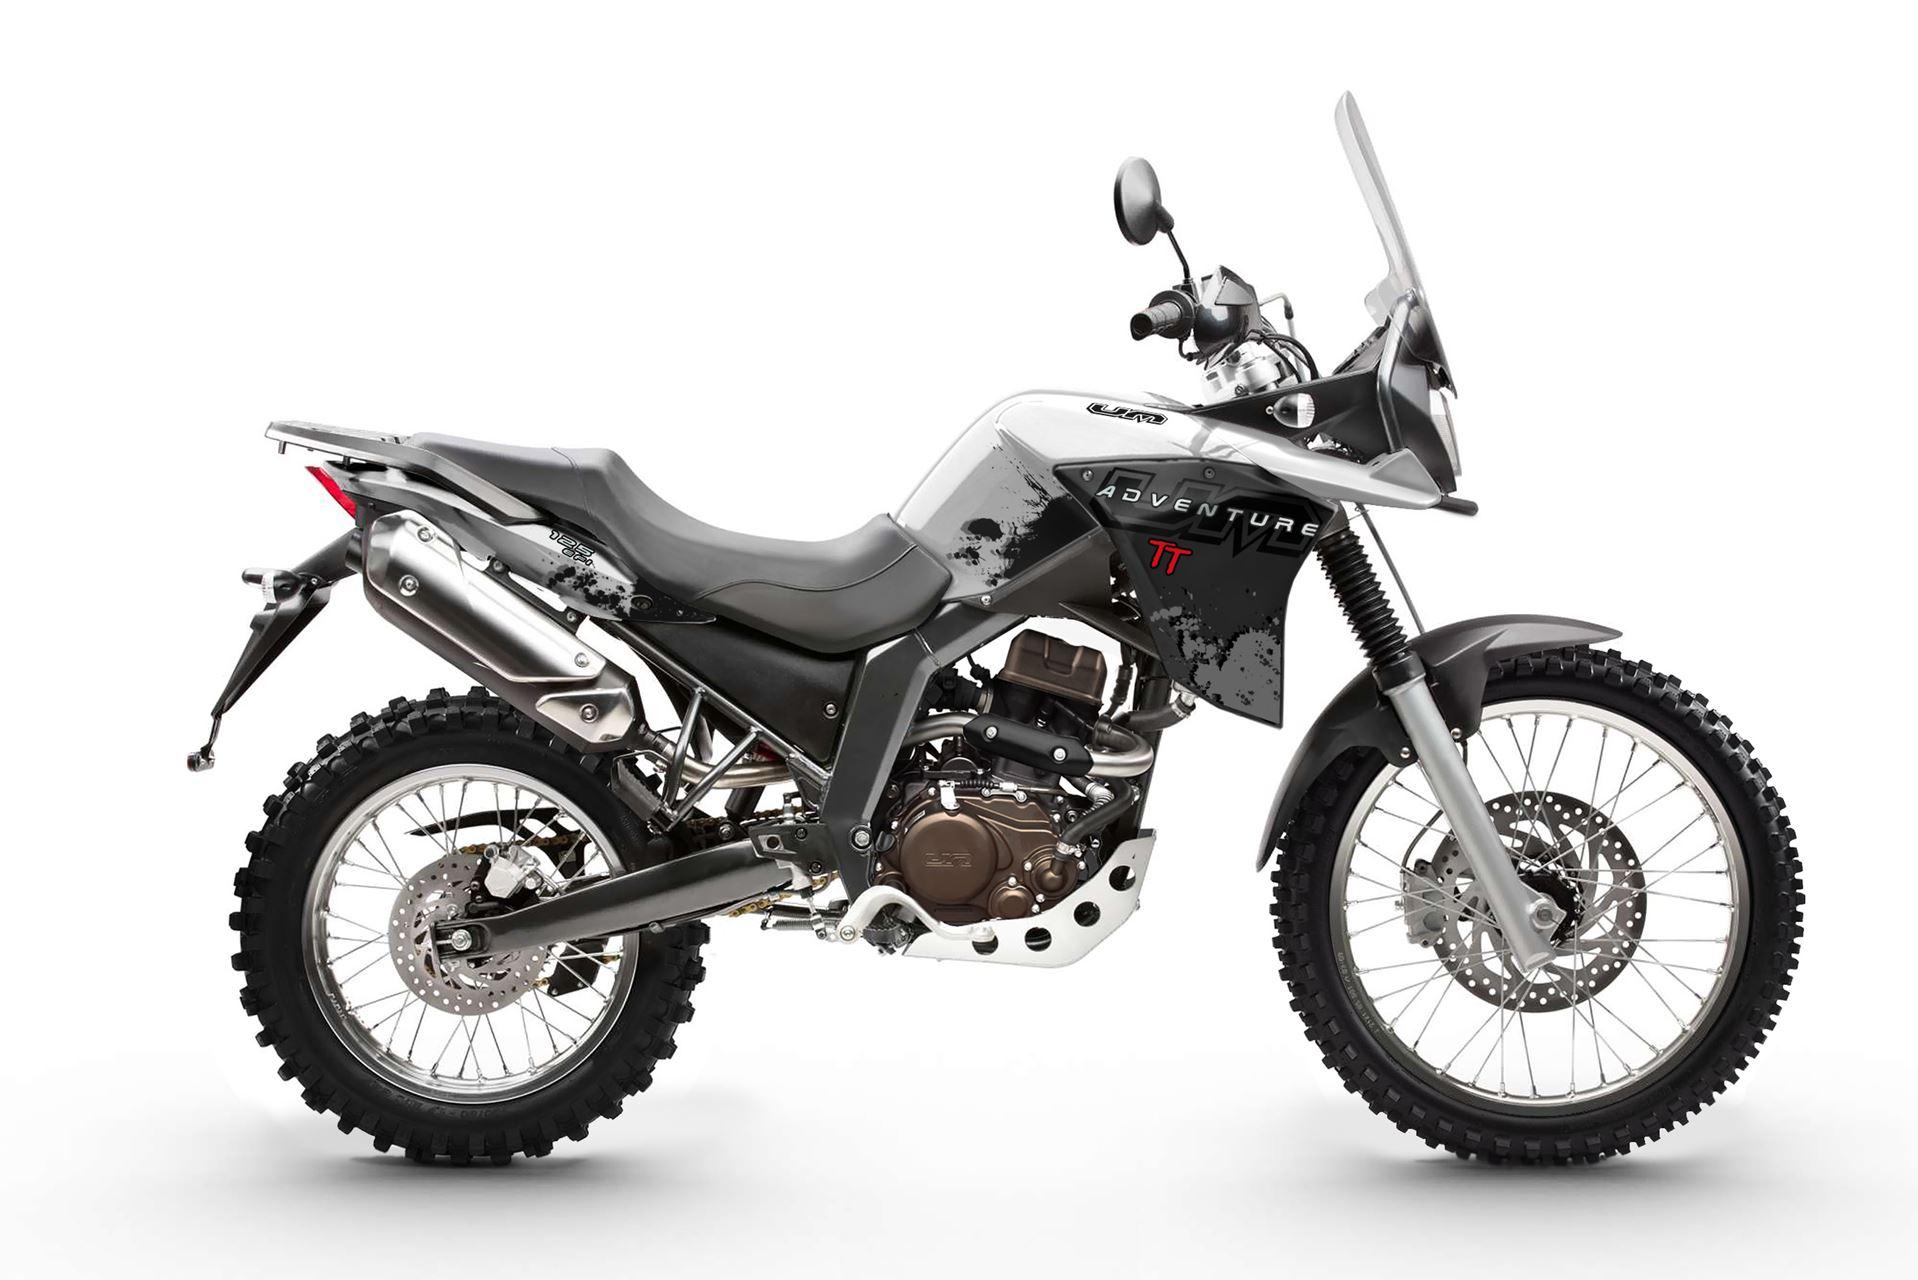 um dsr adventure tt moto dual purpose andar de moto. Black Bedroom Furniture Sets. Home Design Ideas